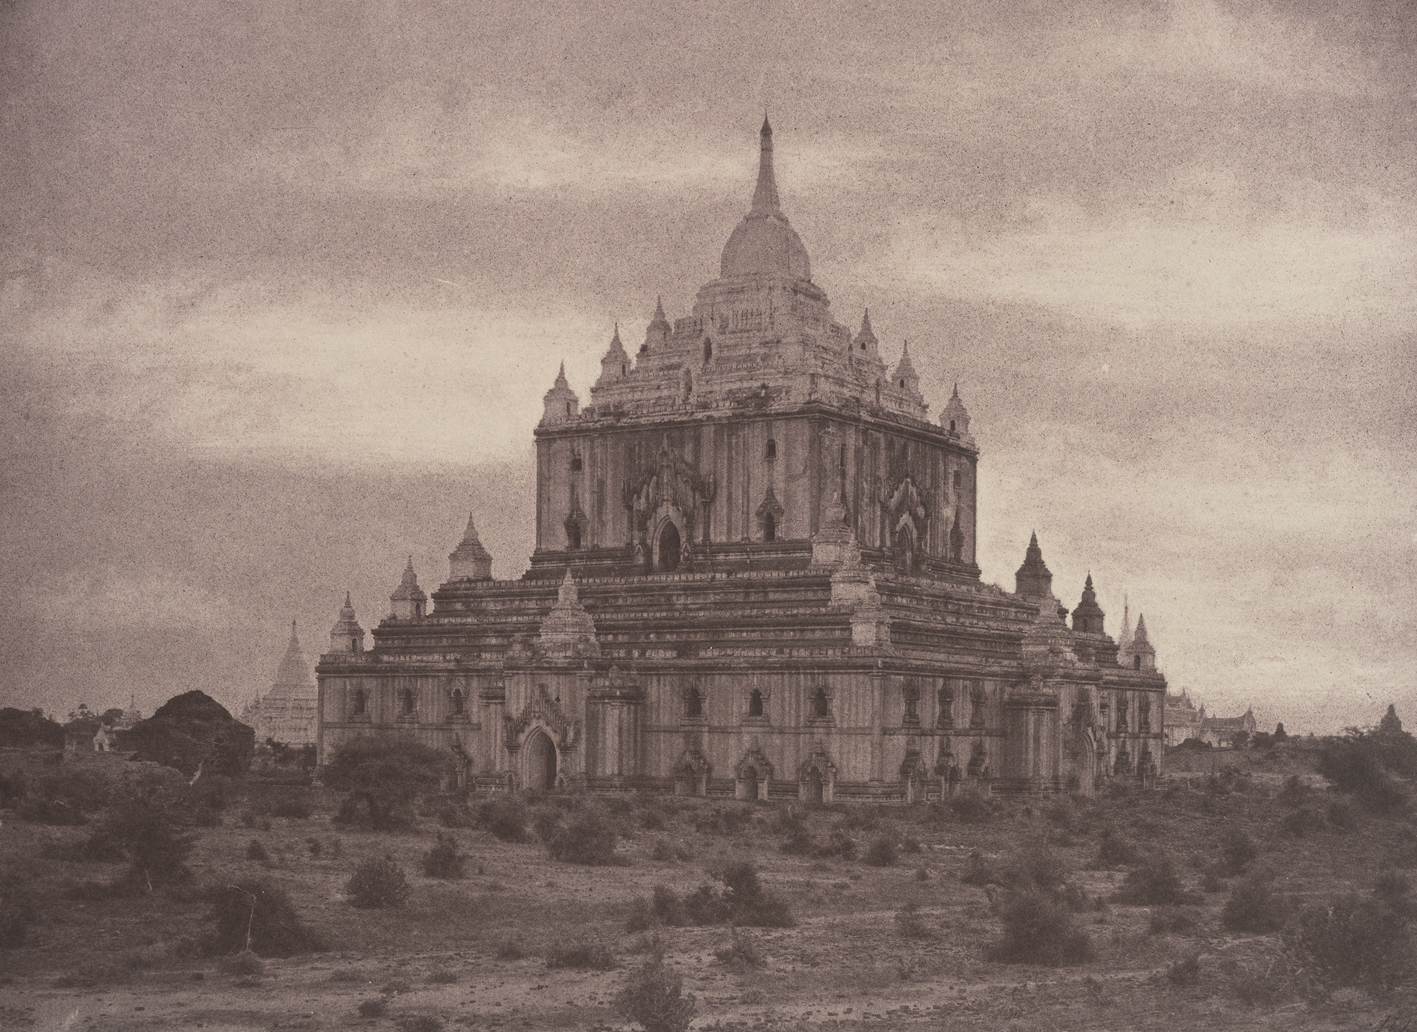 (Captain Linnaeus Tripe: Pugahm Myo: Thapinyu Pagoda, August 20-24, 1855)